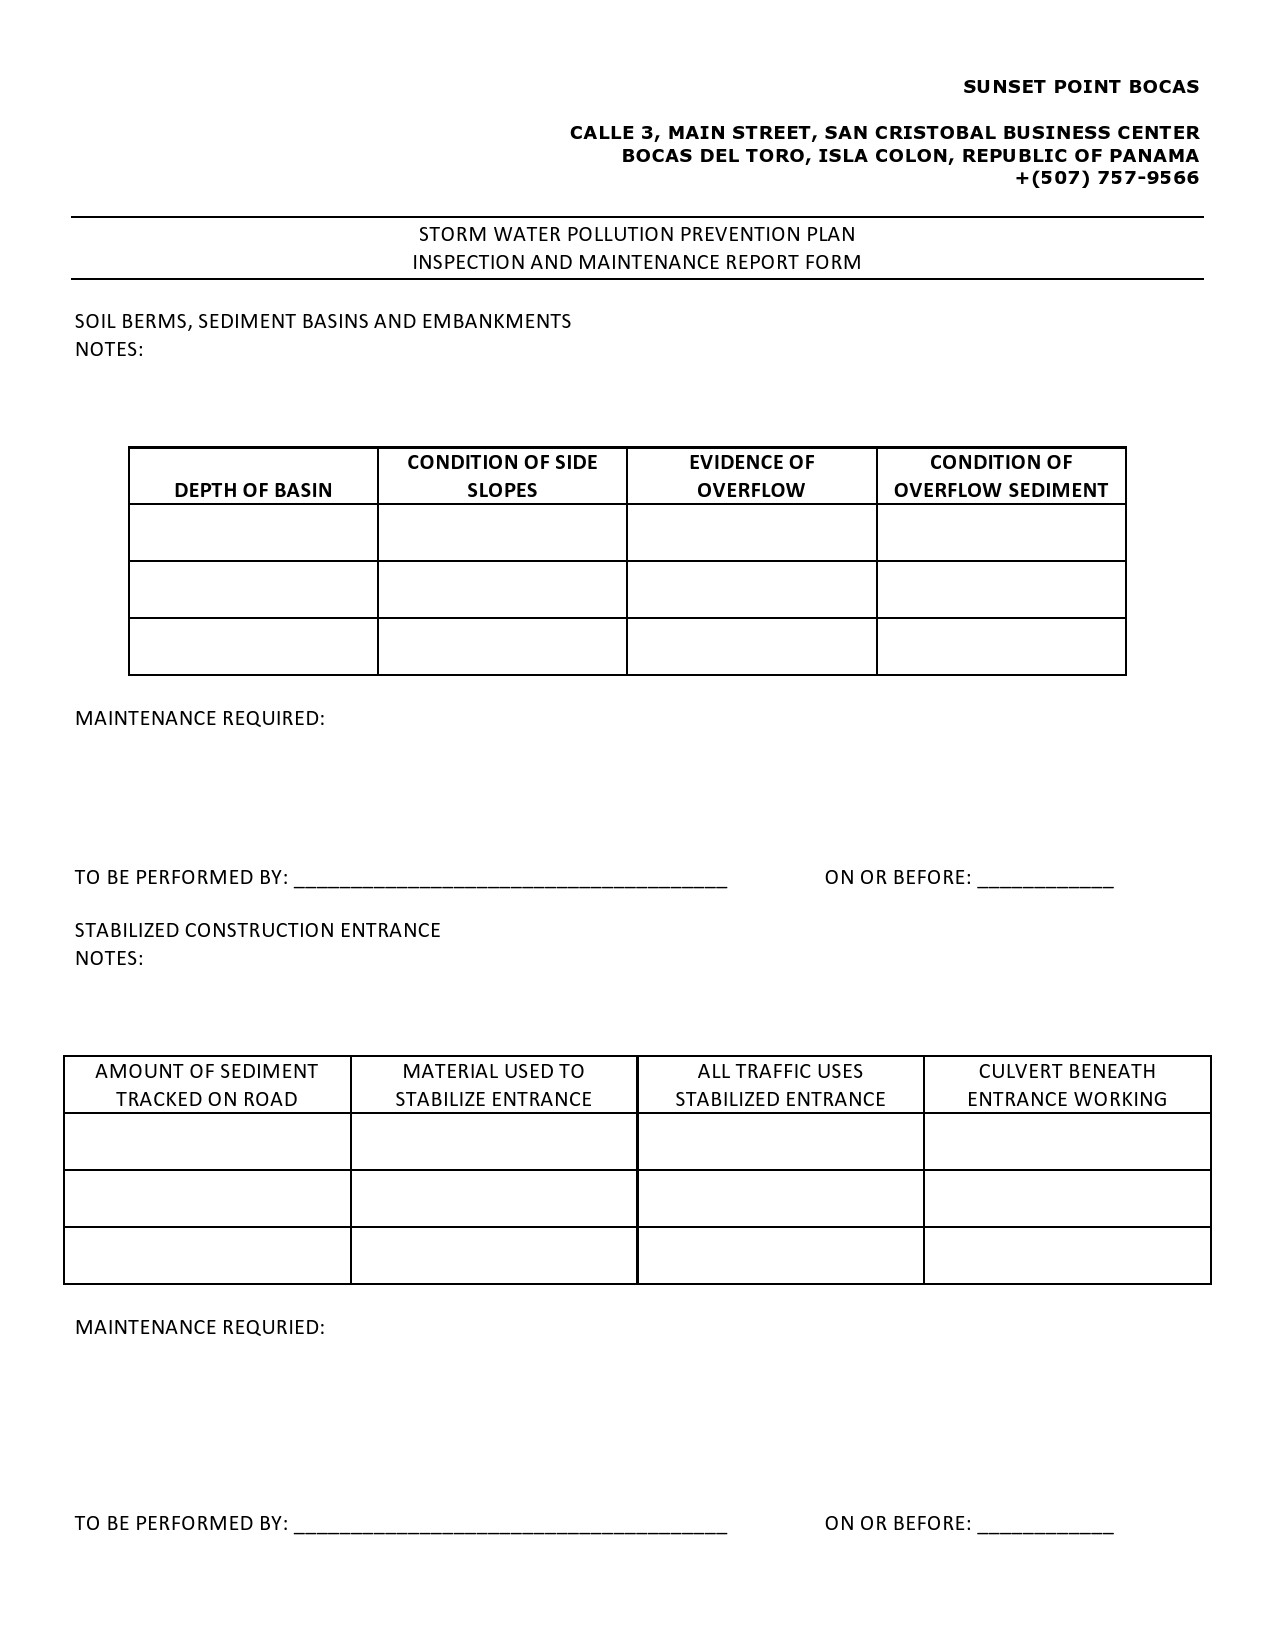 Free maintenance report form 26